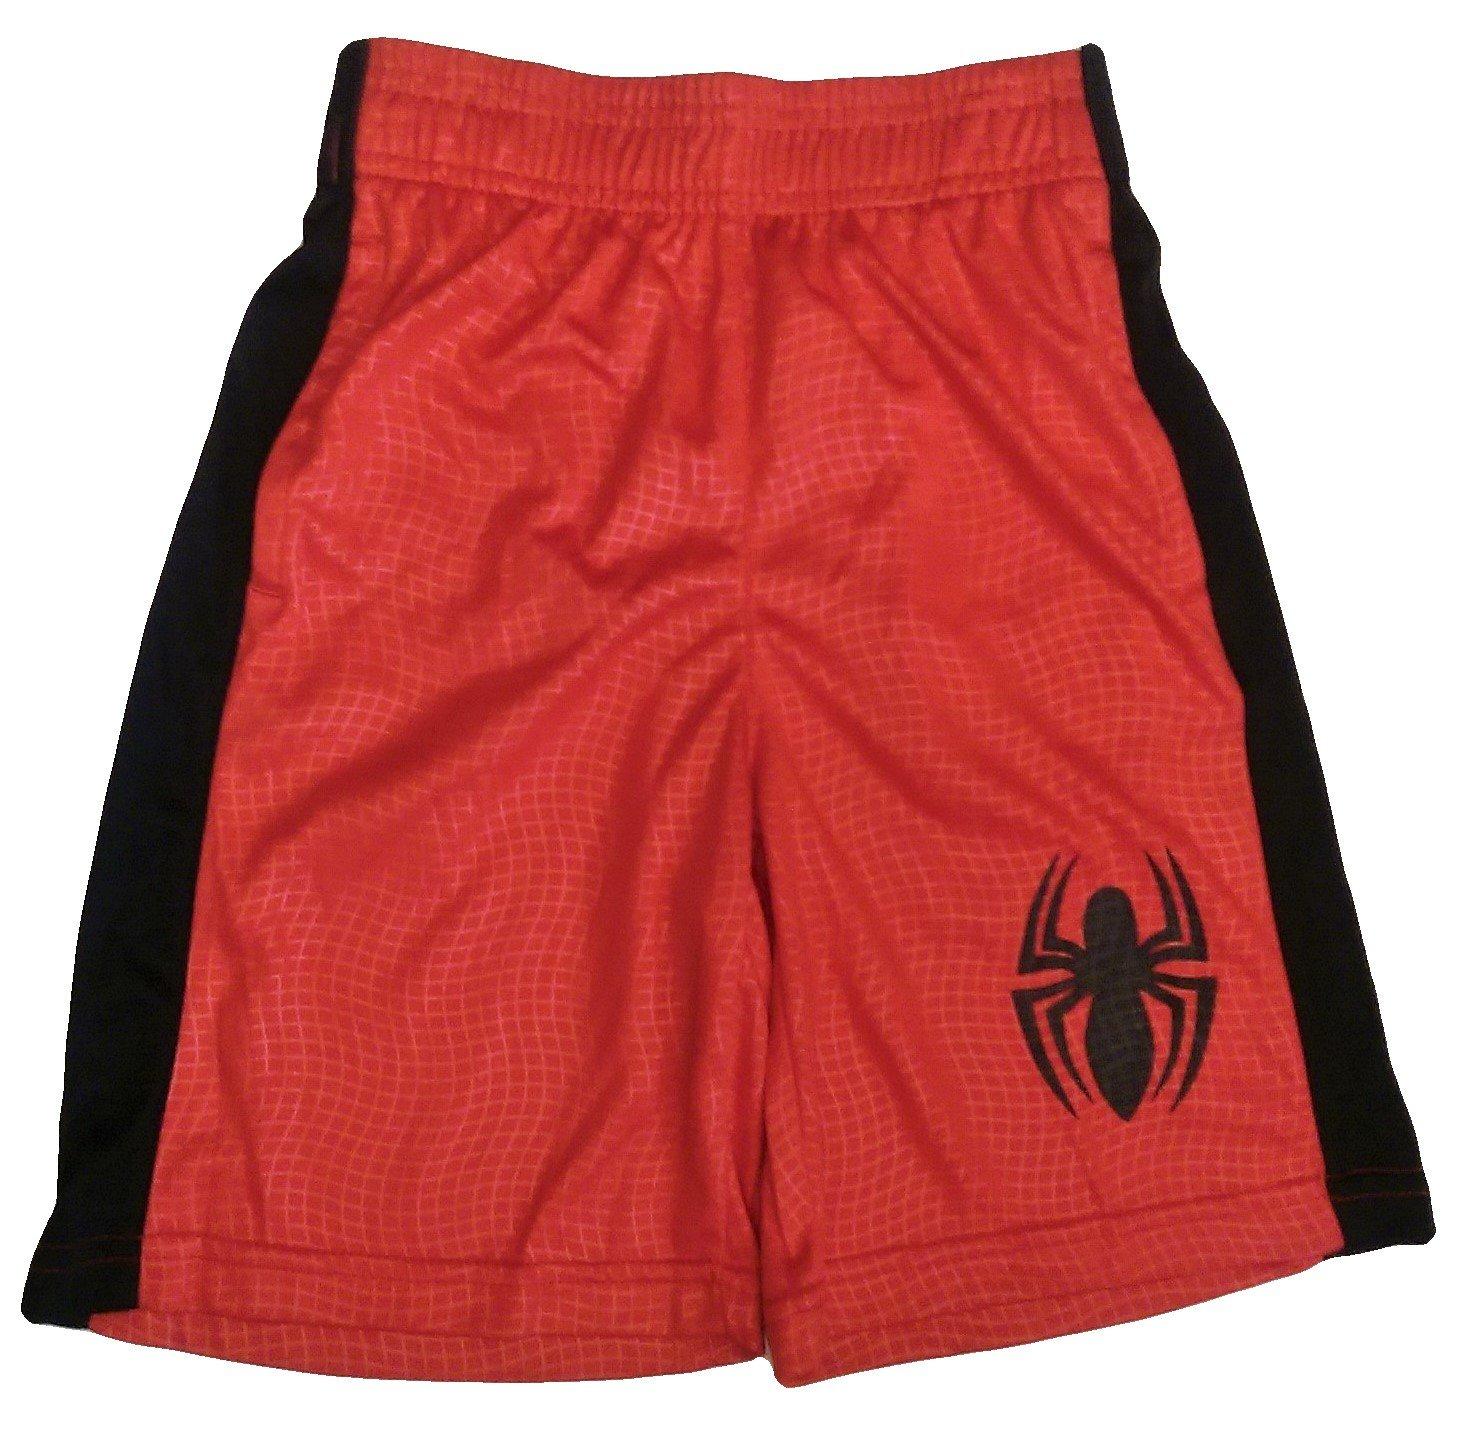 Bundled Brands Boys Youth Printed Performance Basketball Athletic Shorts (Medium 8, Red - Spiderman)